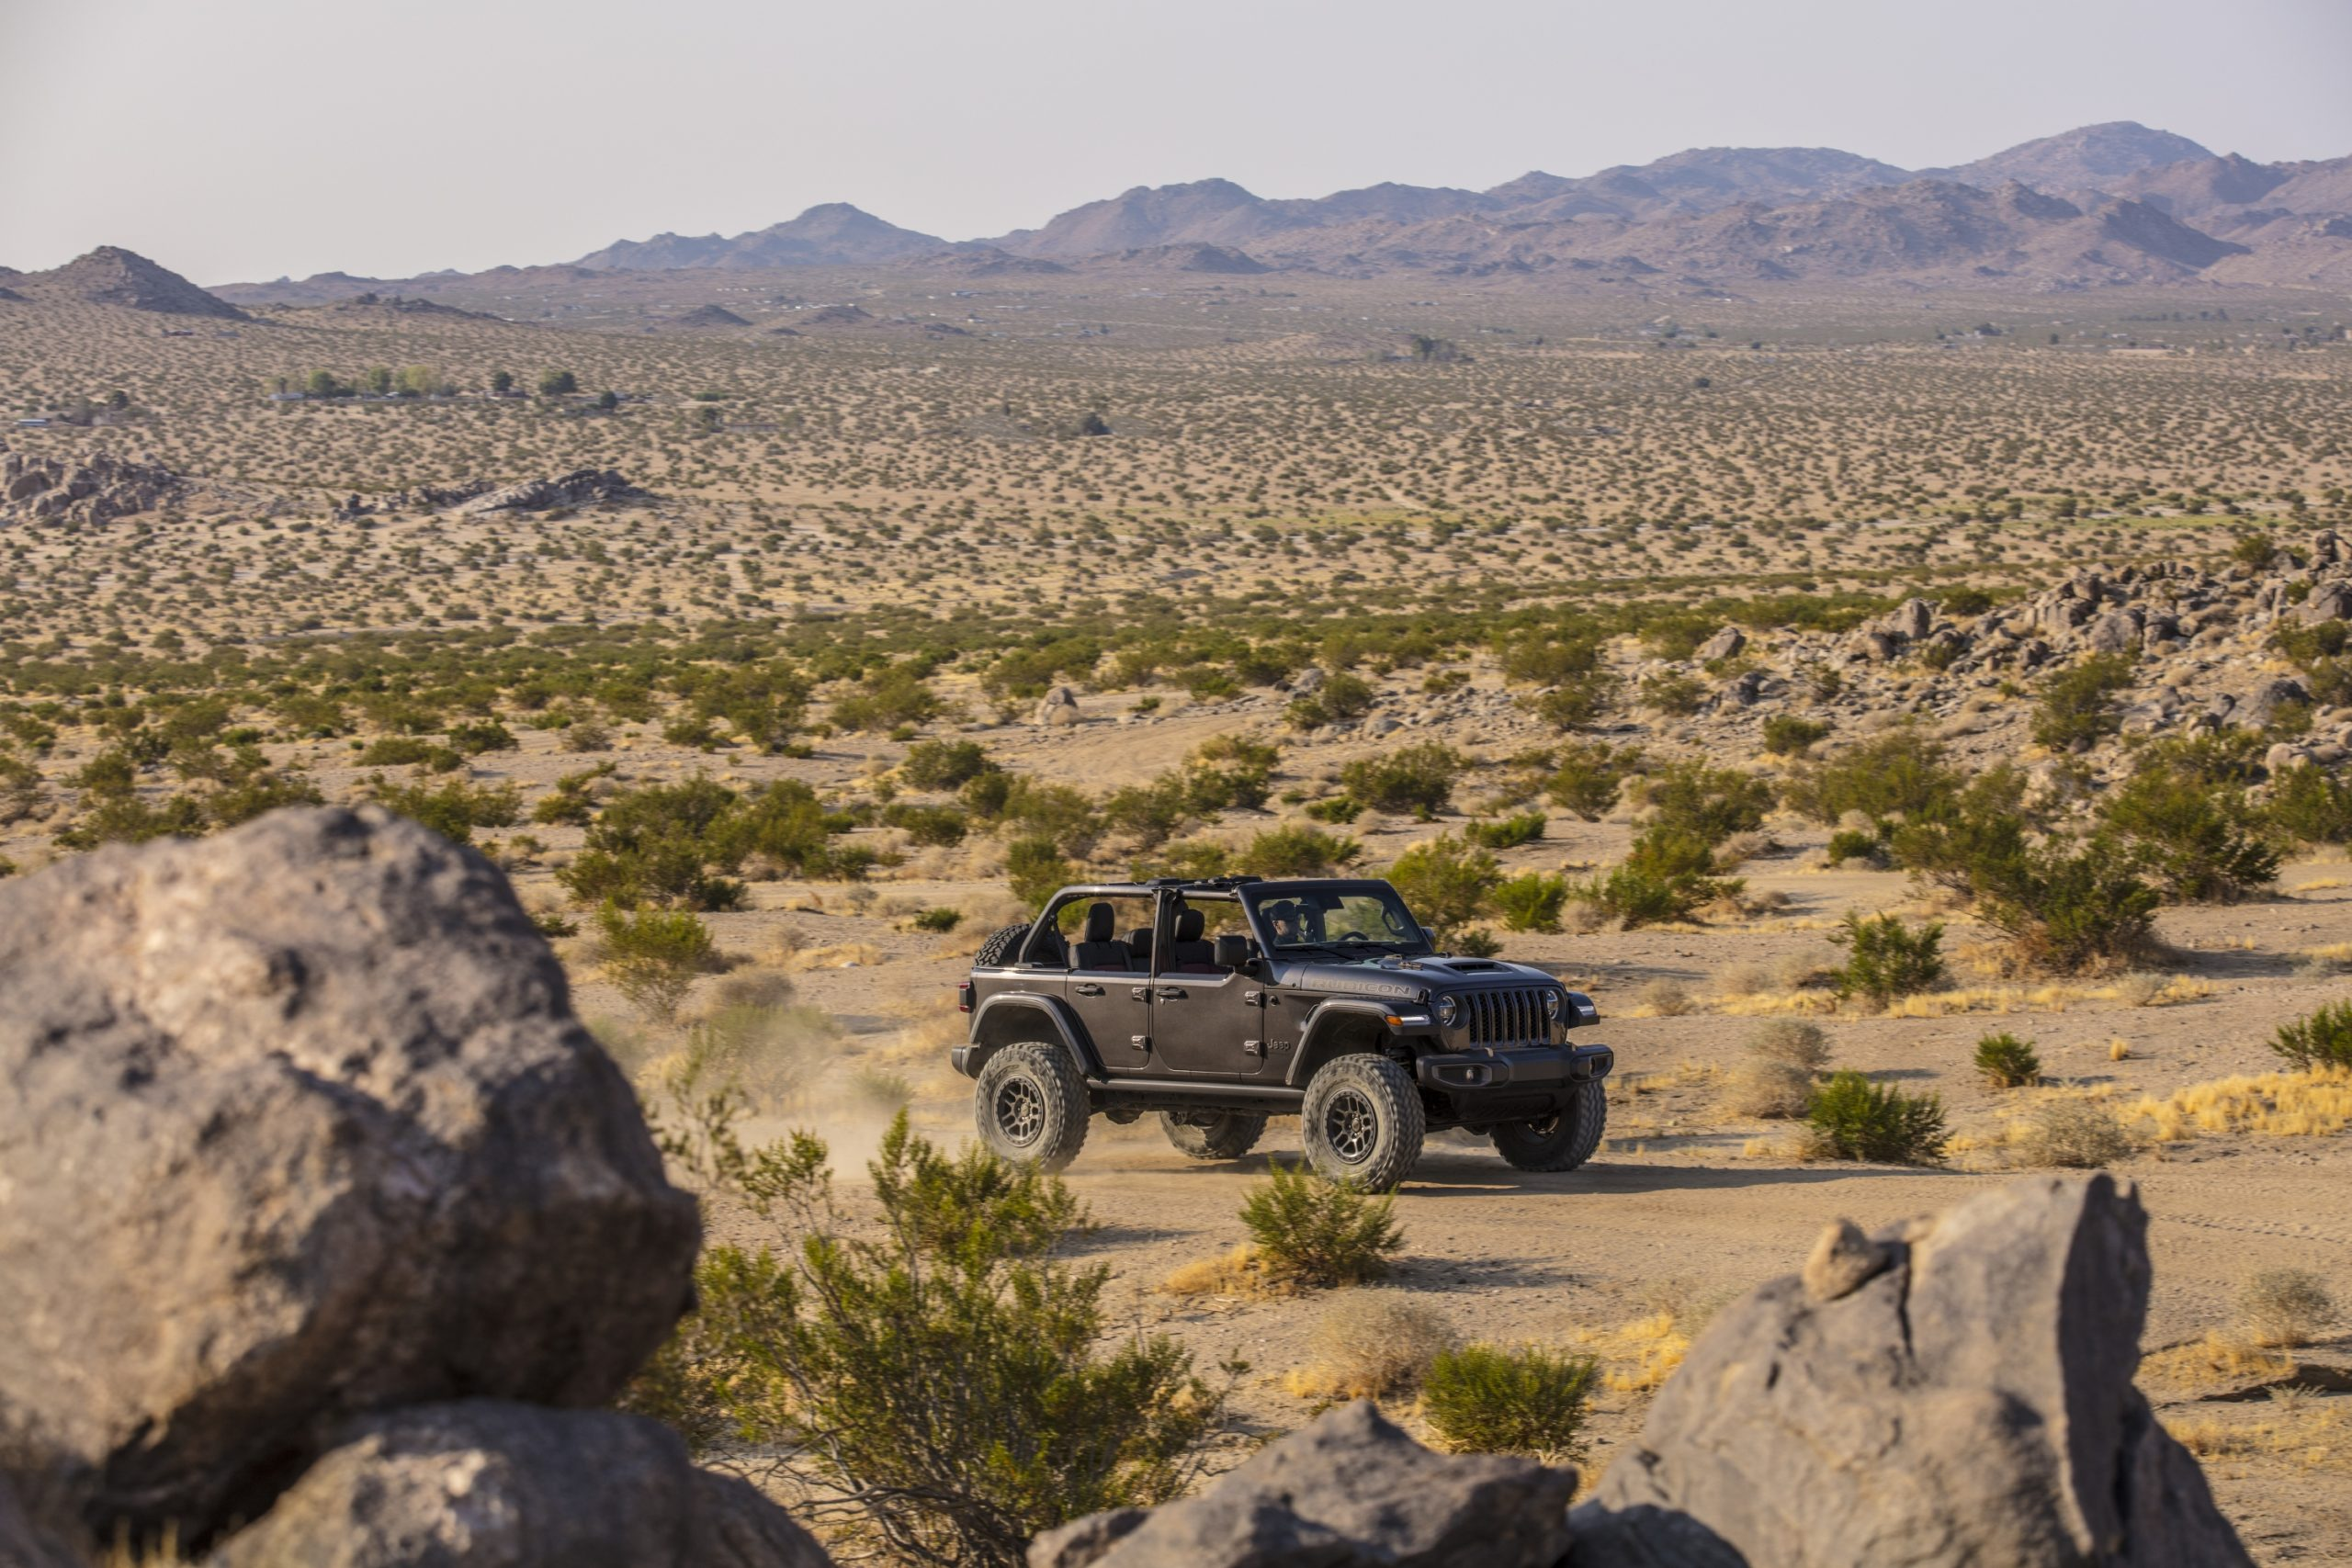 2021 Jeep Wrangler Rubicon 392 gray cruising in desert